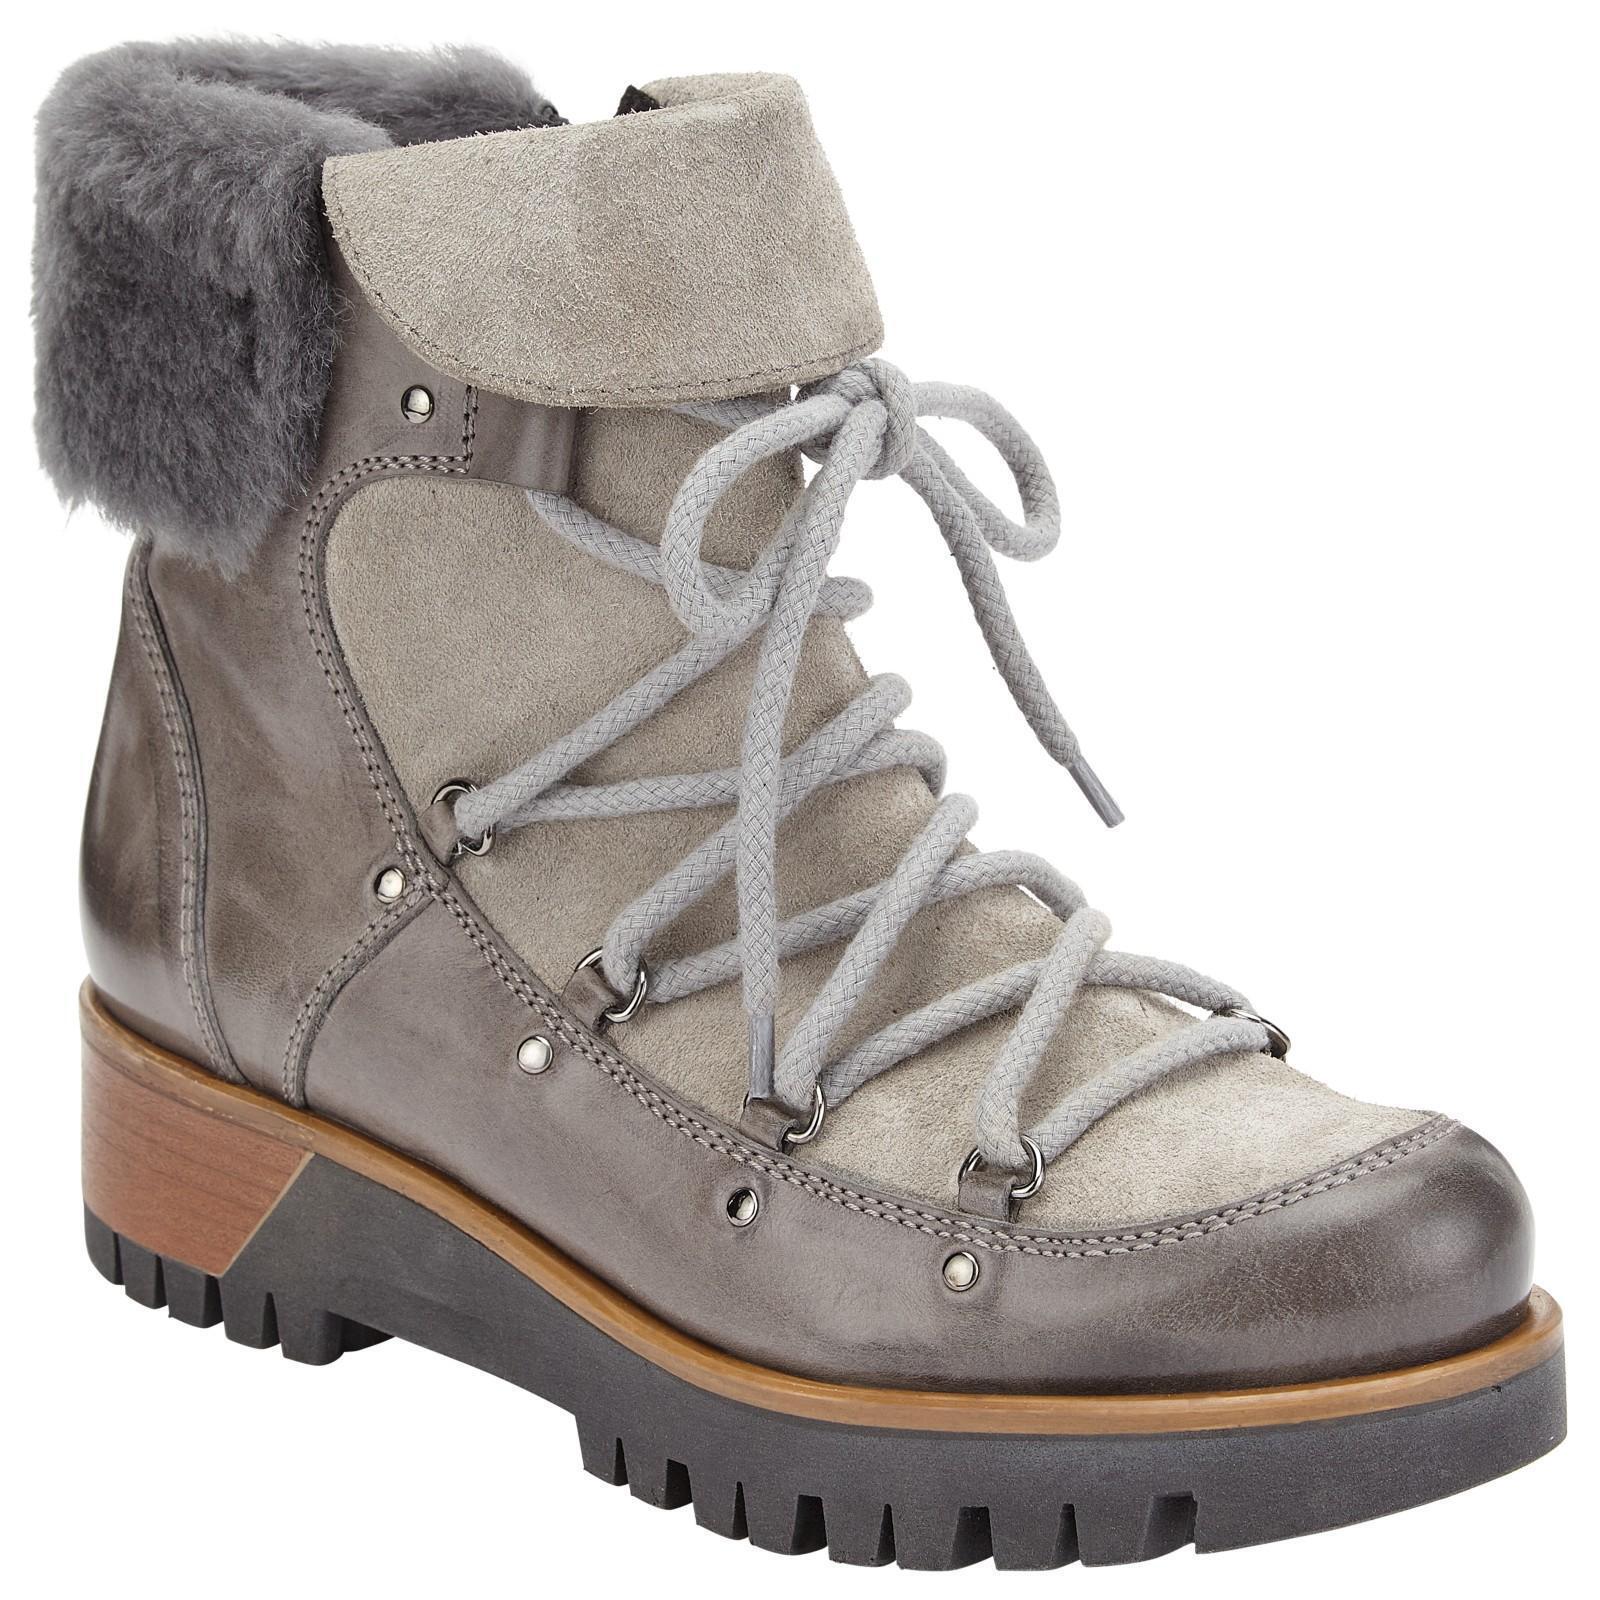 John Lewis Filomena Gamuza 6 Cuero Cremallera Excursionista Tobillo botas De Invierno gris 6 Gamuza & 8 072151